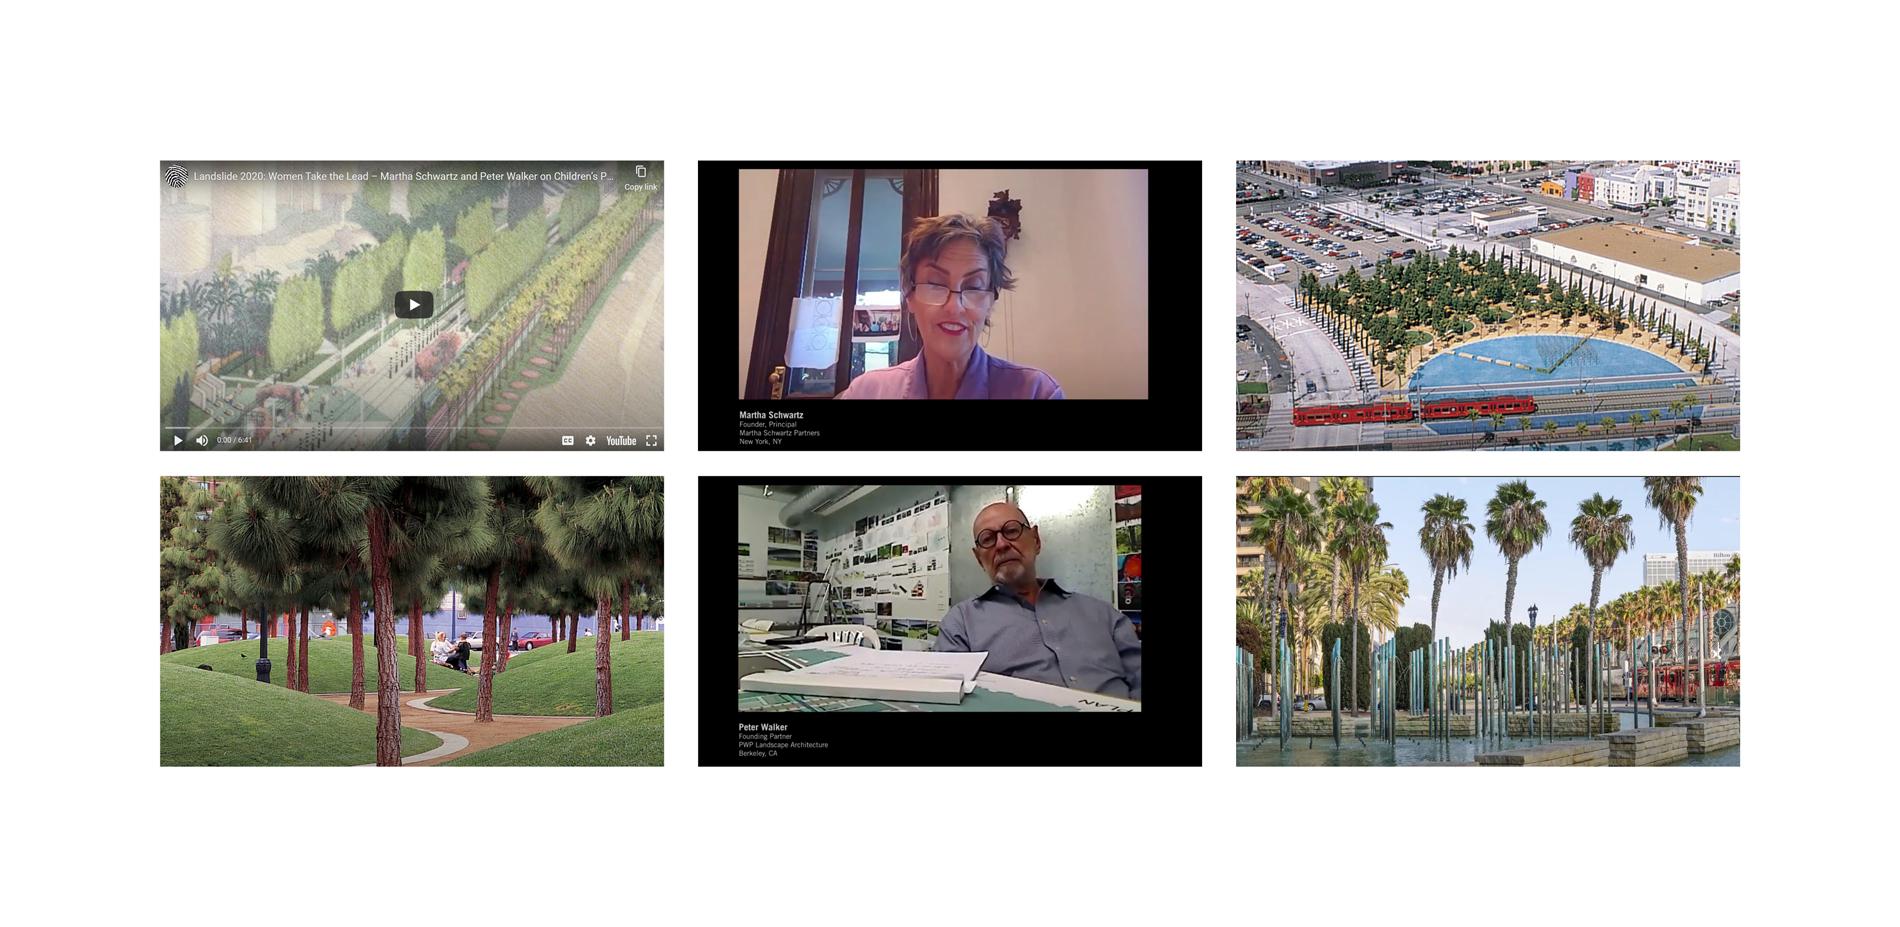 Landslide 2020: Women Take the Lead - Landslide 2020 screen grabs with Schwartz and Walker interviews